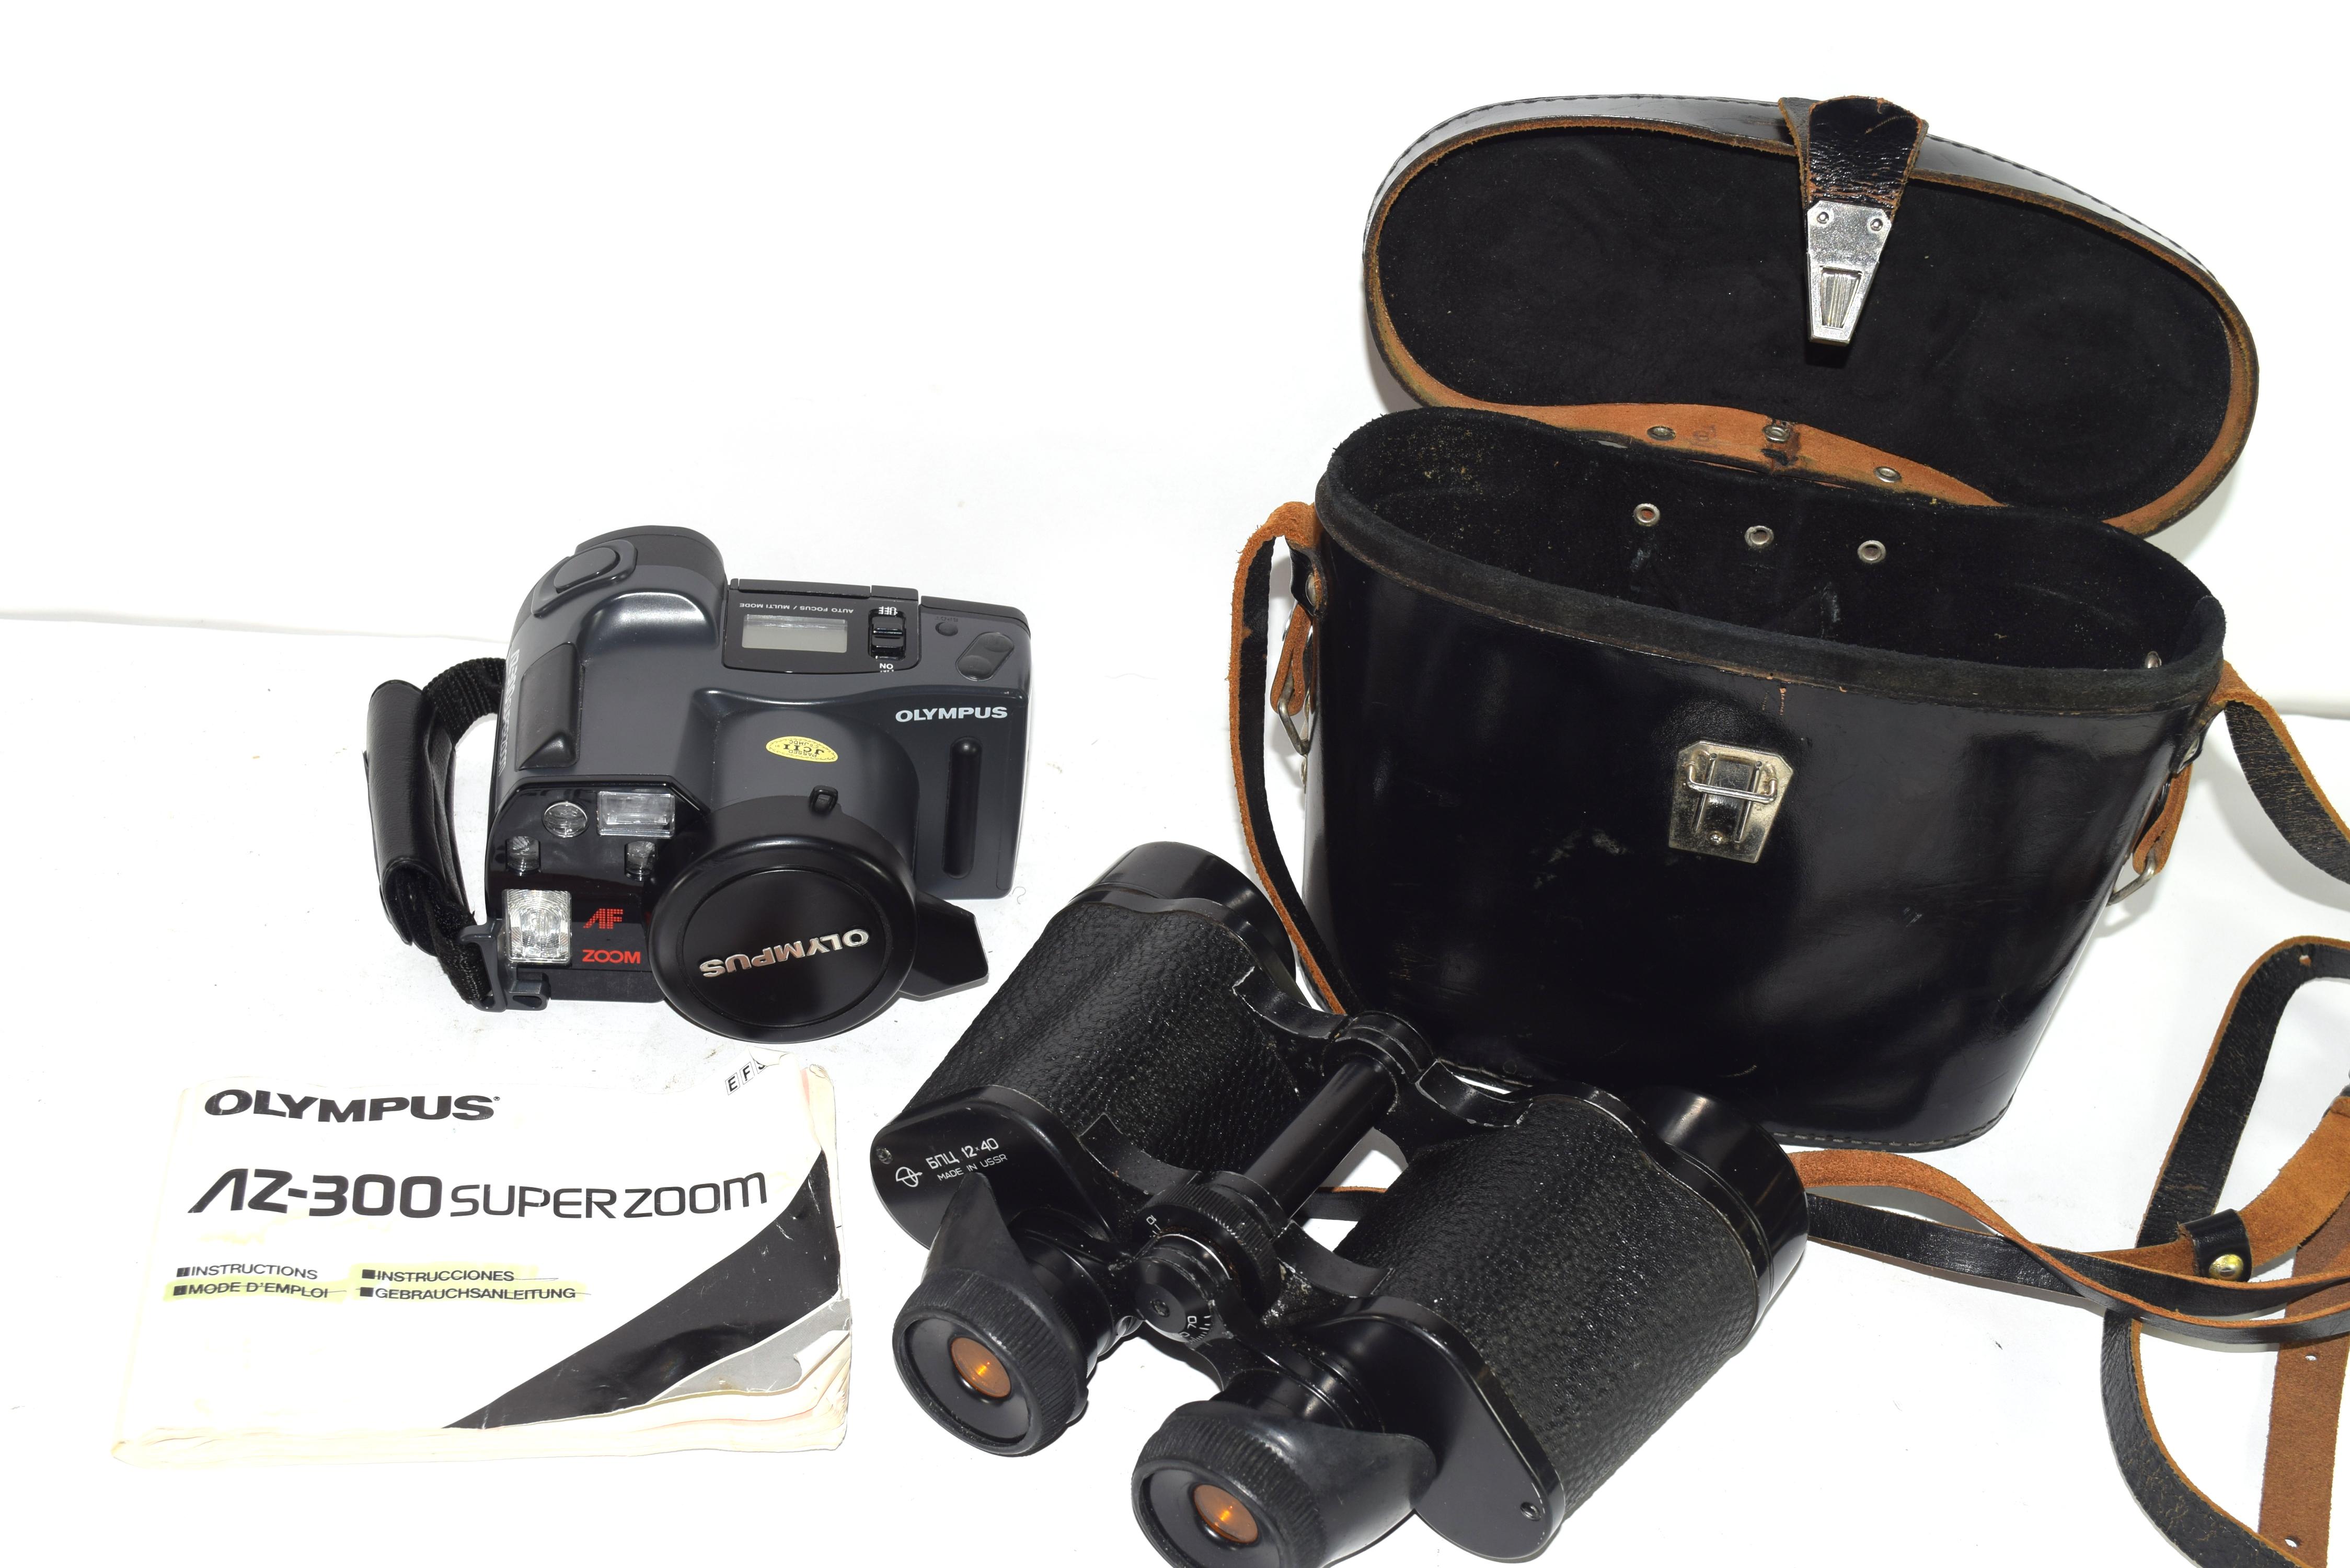 Binoculars in original black leather case and an Olympus camera (2) - Image 2 of 6